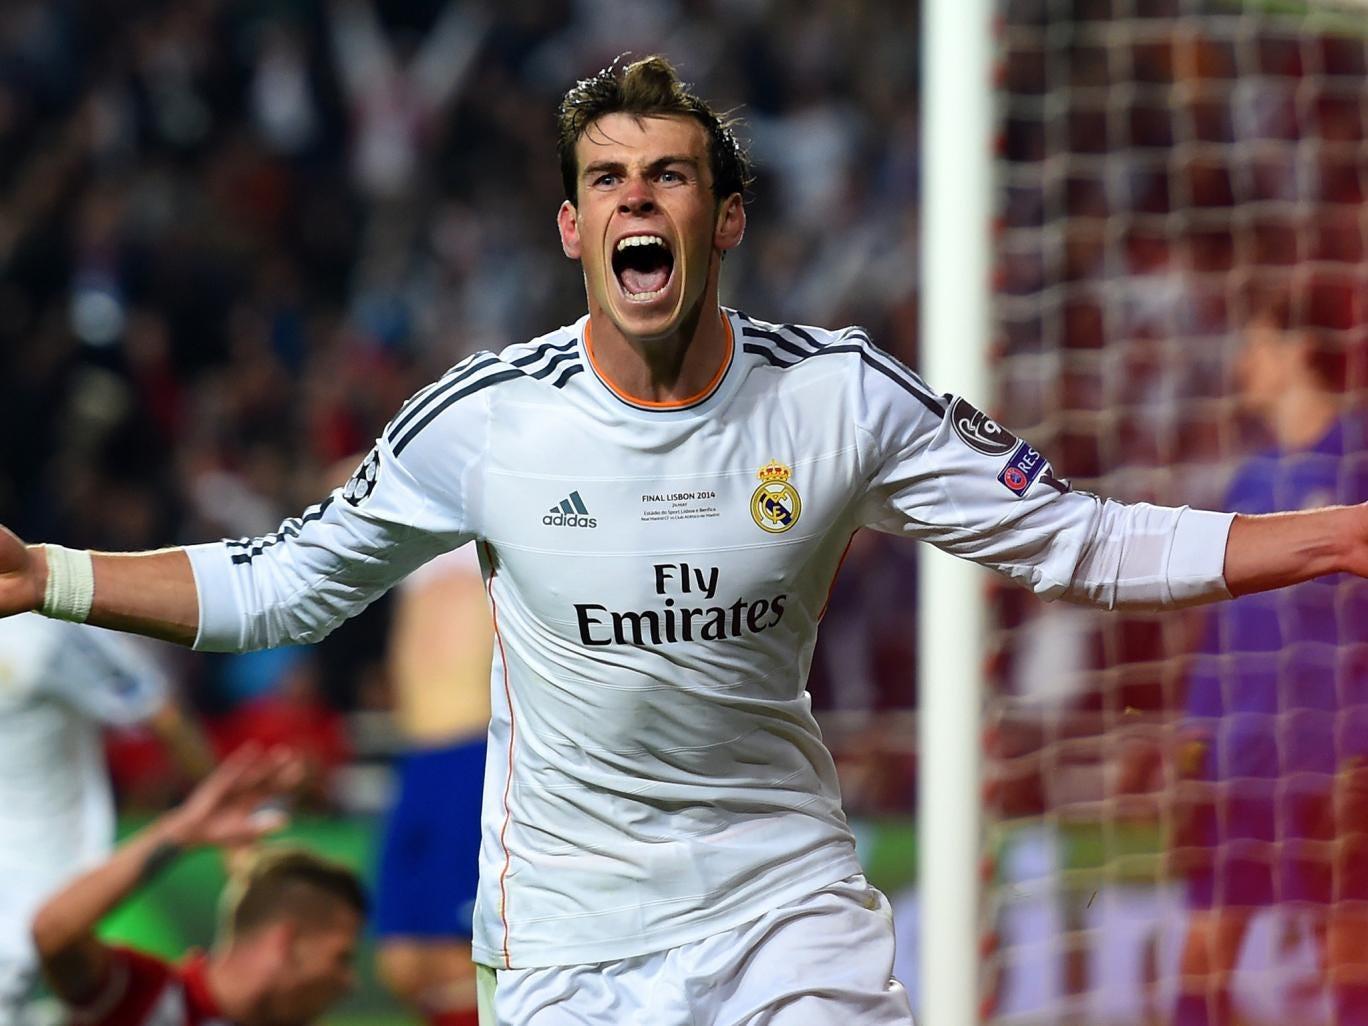 Gareth Bale celebrates scoring the winning goal in the Champions League final